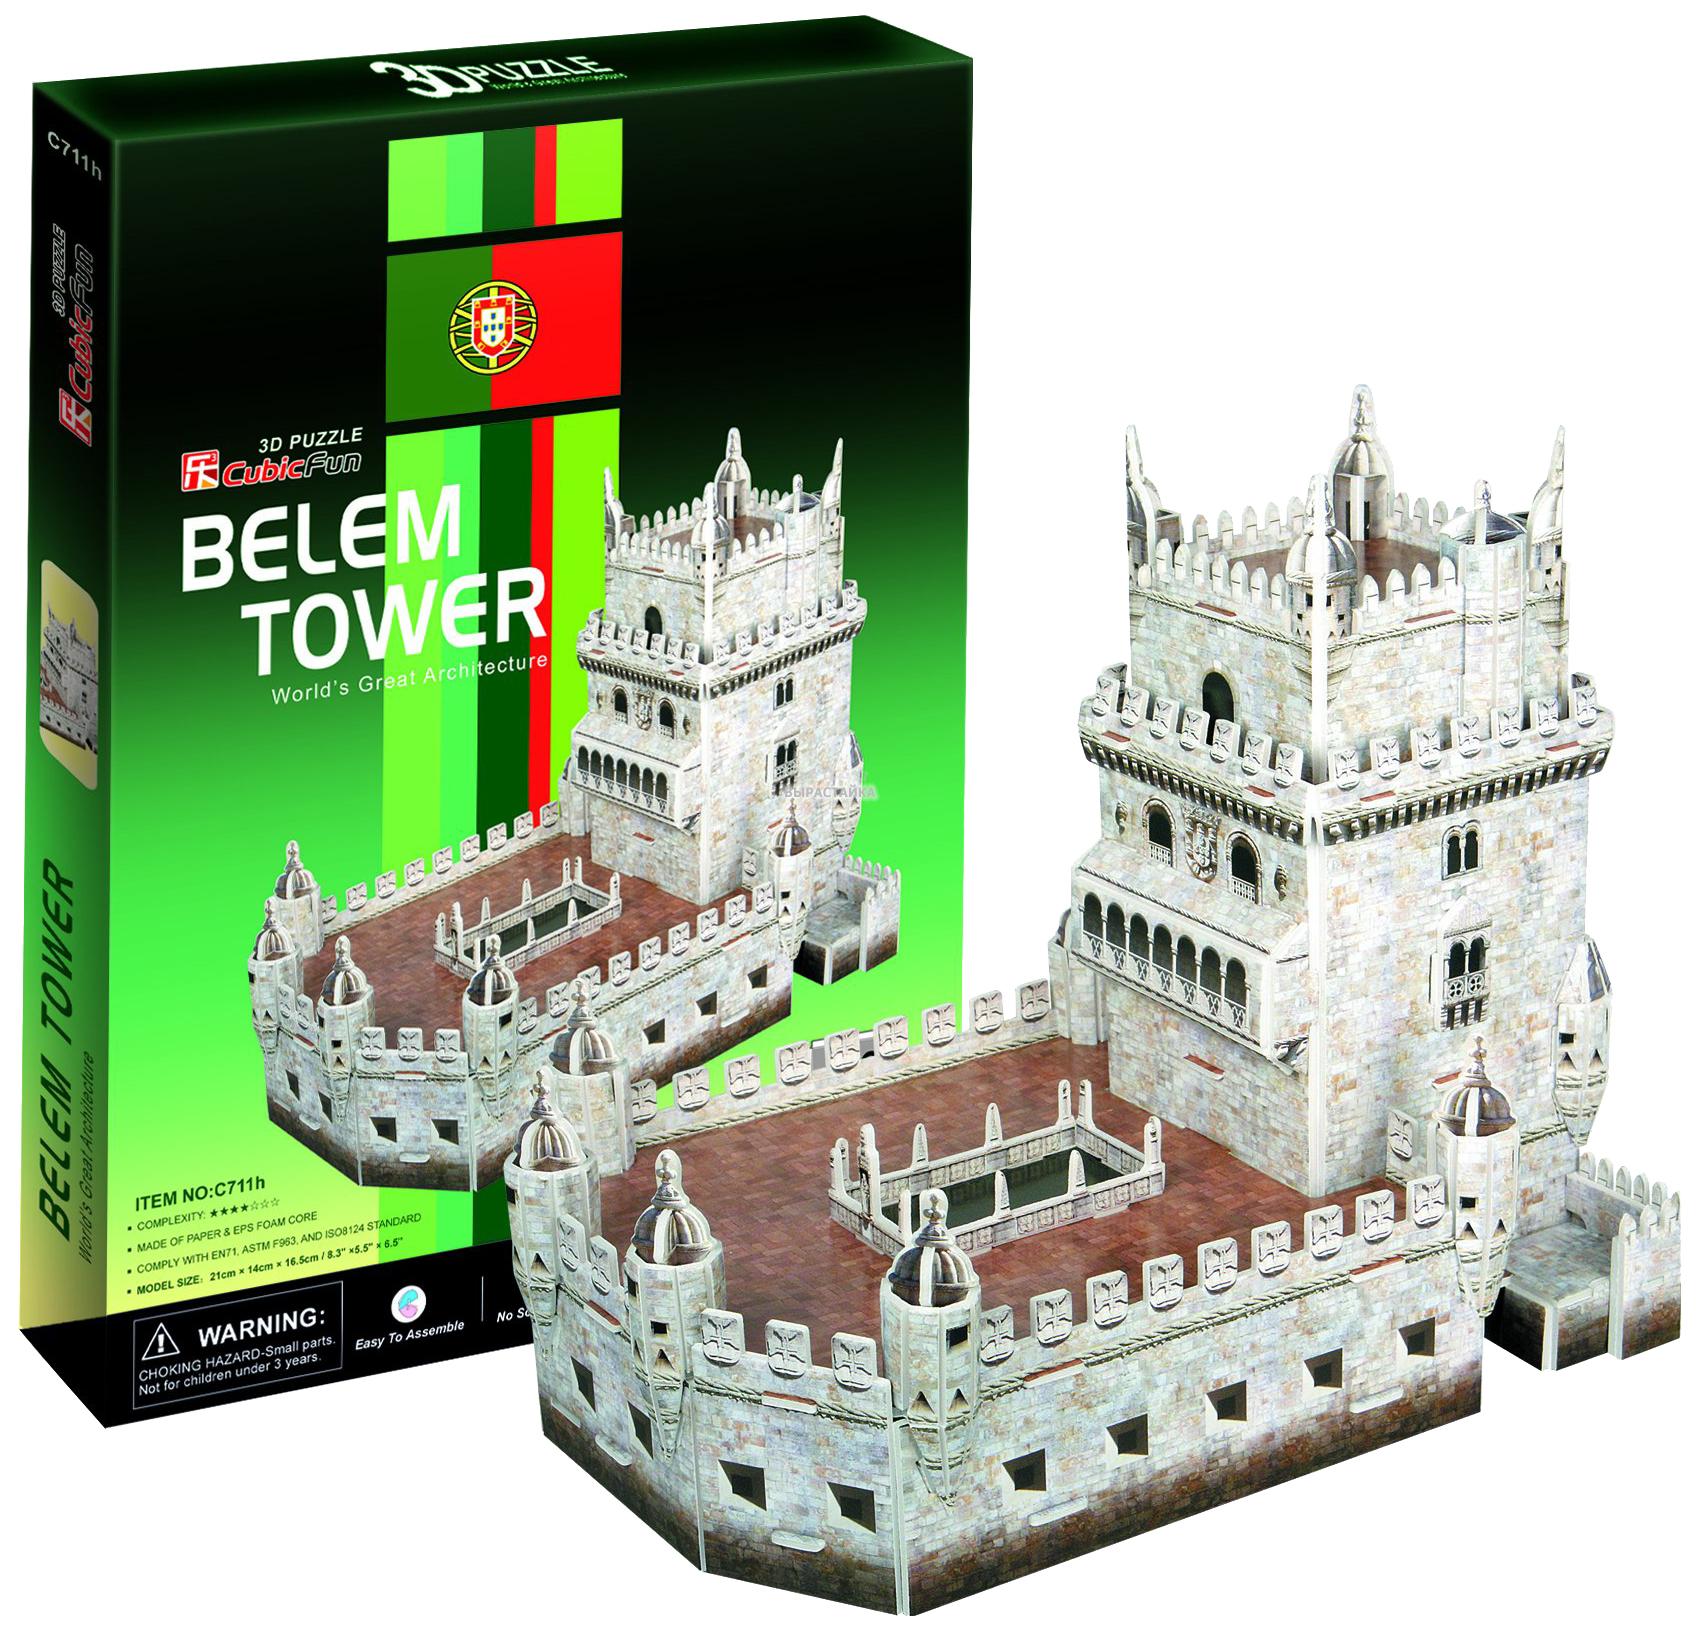 Купить Пазл Cubic Fun 3D C711h Кубик фан Башня Белен (Португалия), CubicFun, Пазлы